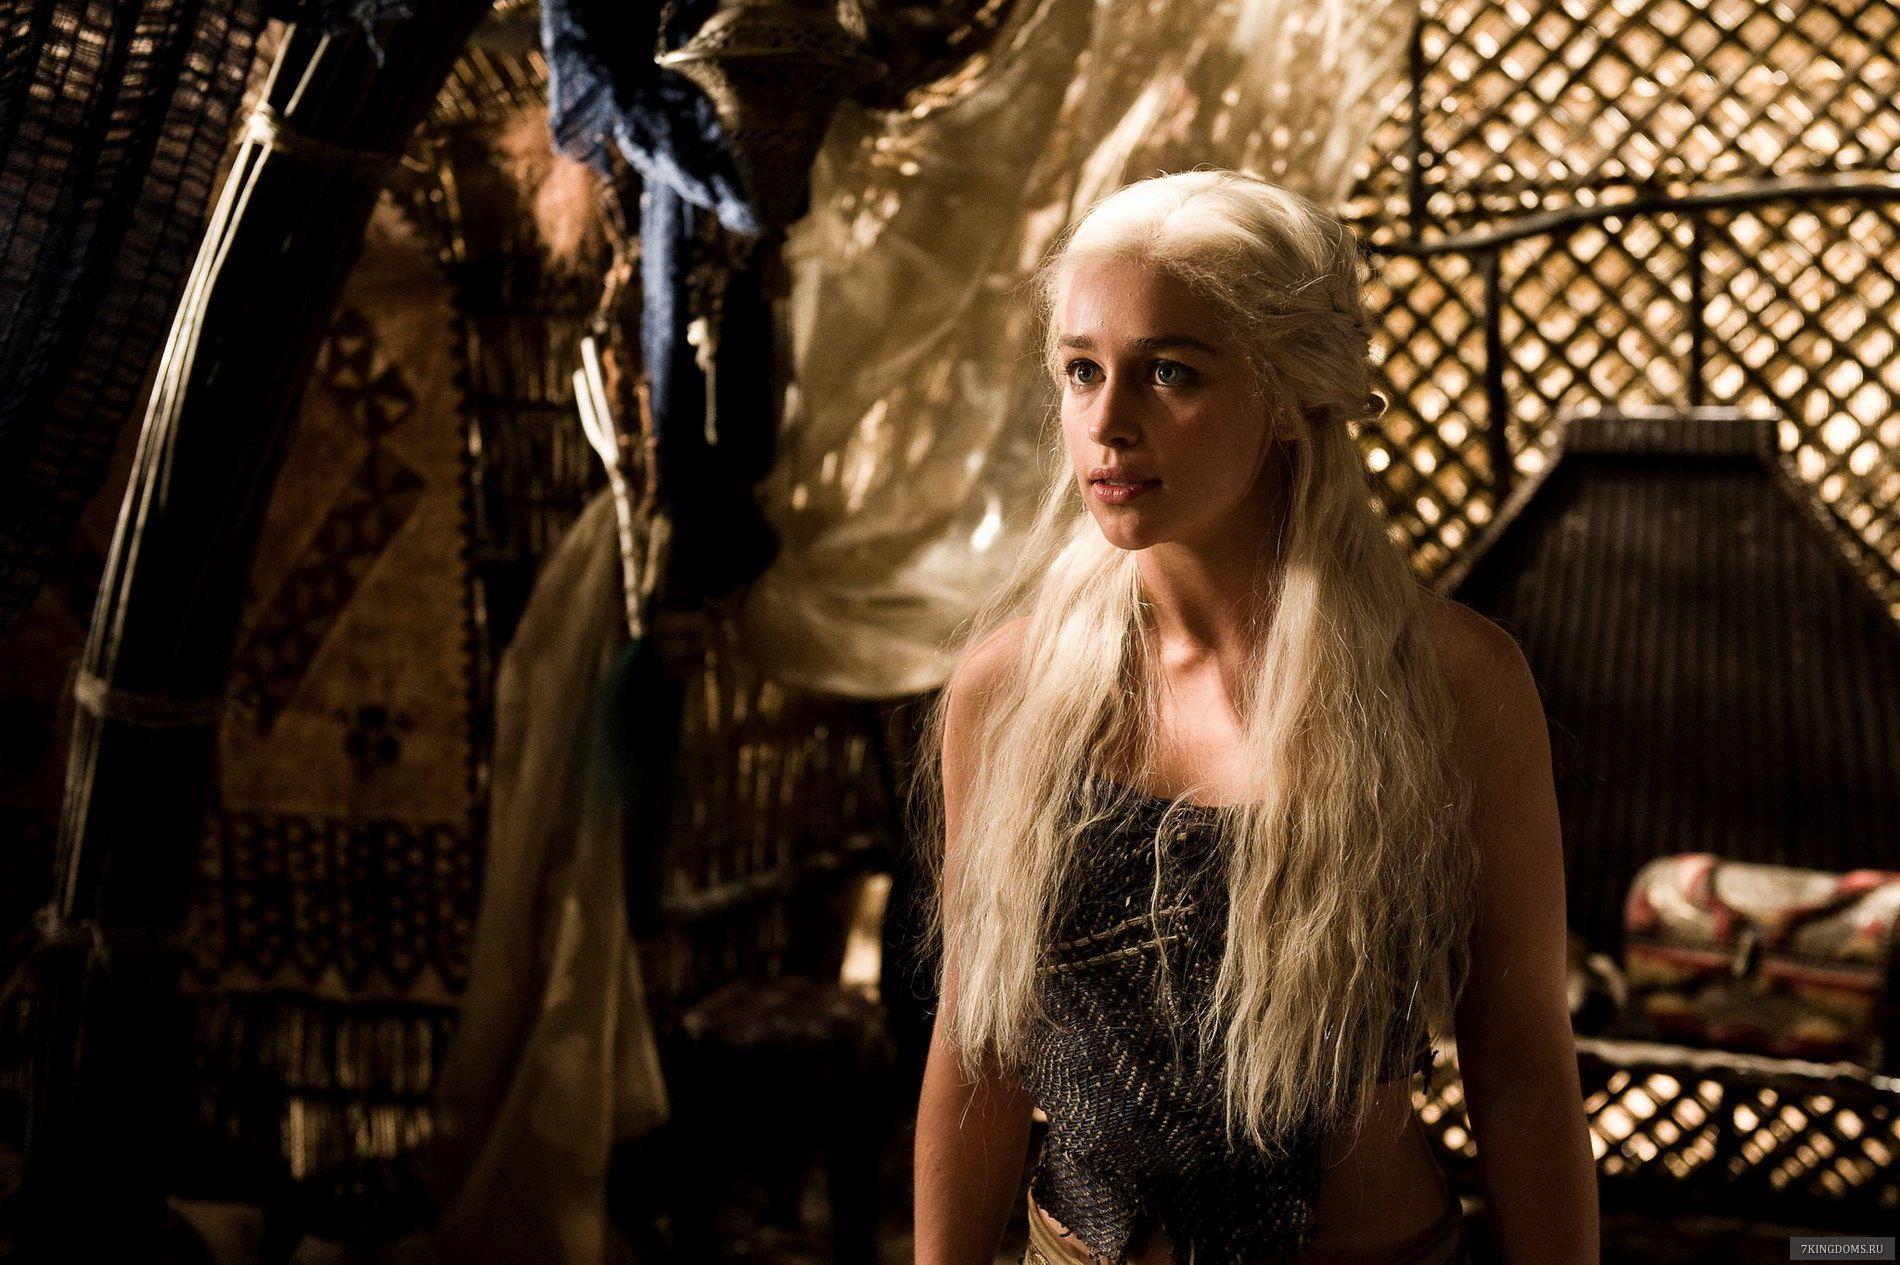 Daenerys targaryen and khal drogo wallpaper daenerys targaryen wedding - Khal Drogo Daenerys Targaryen The Mother Of Dragons